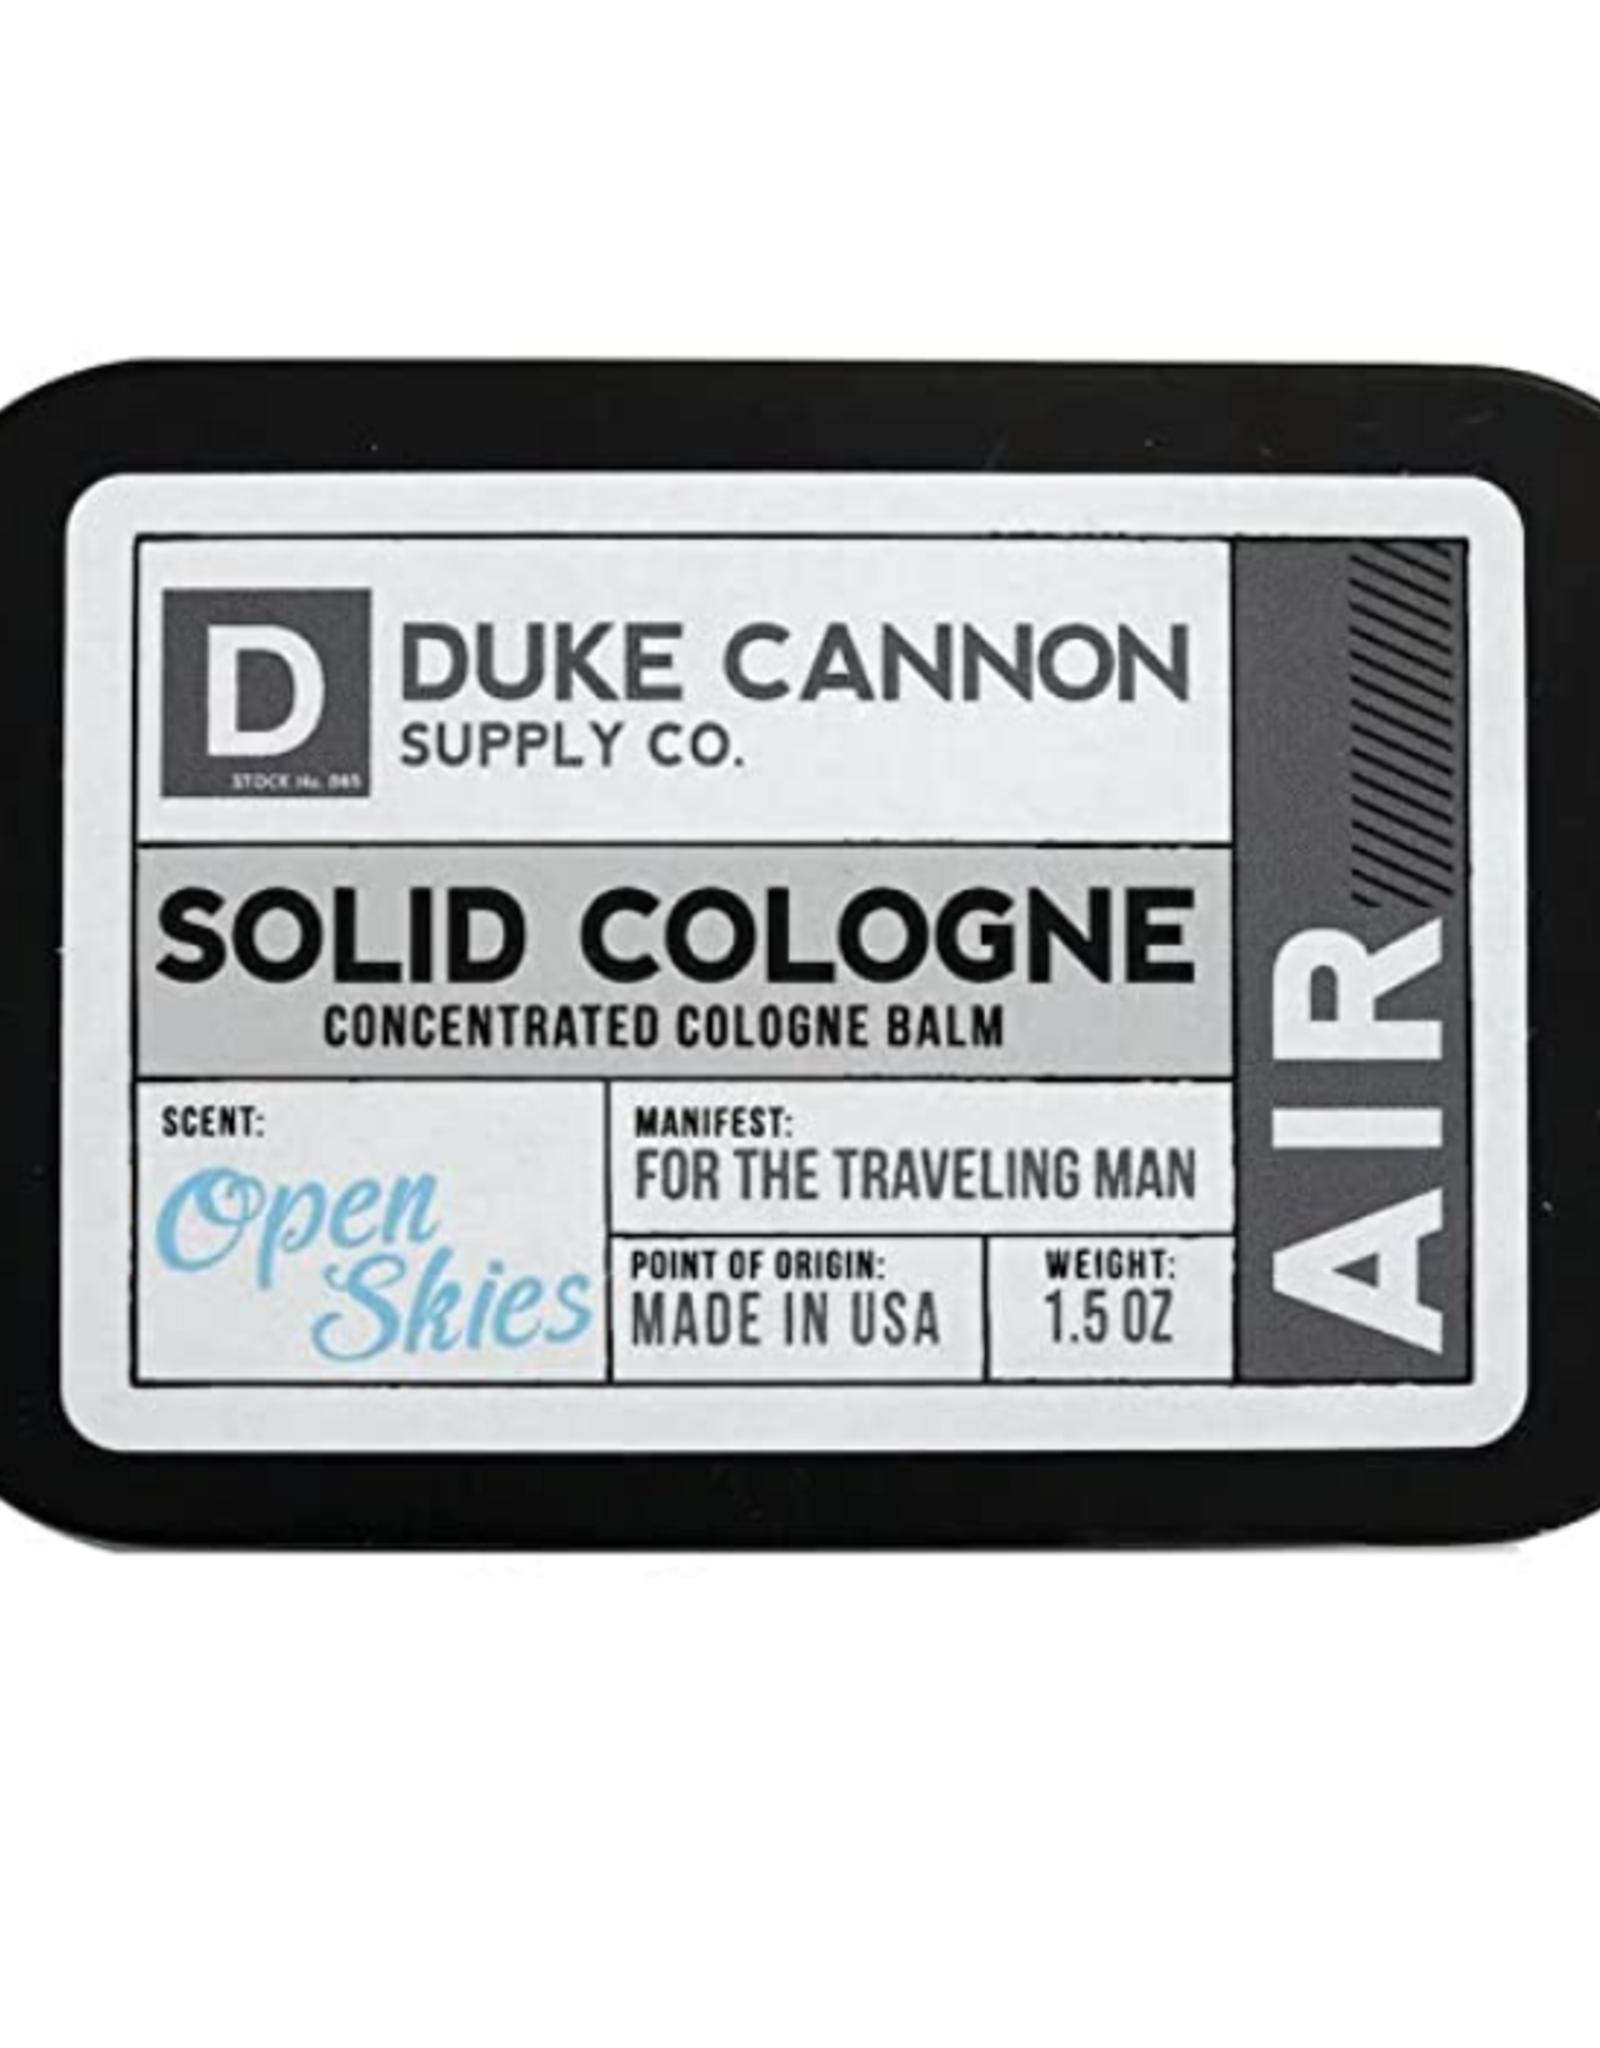 Duke Cannon Duke Cannon - Traveling Colonge Open Skies